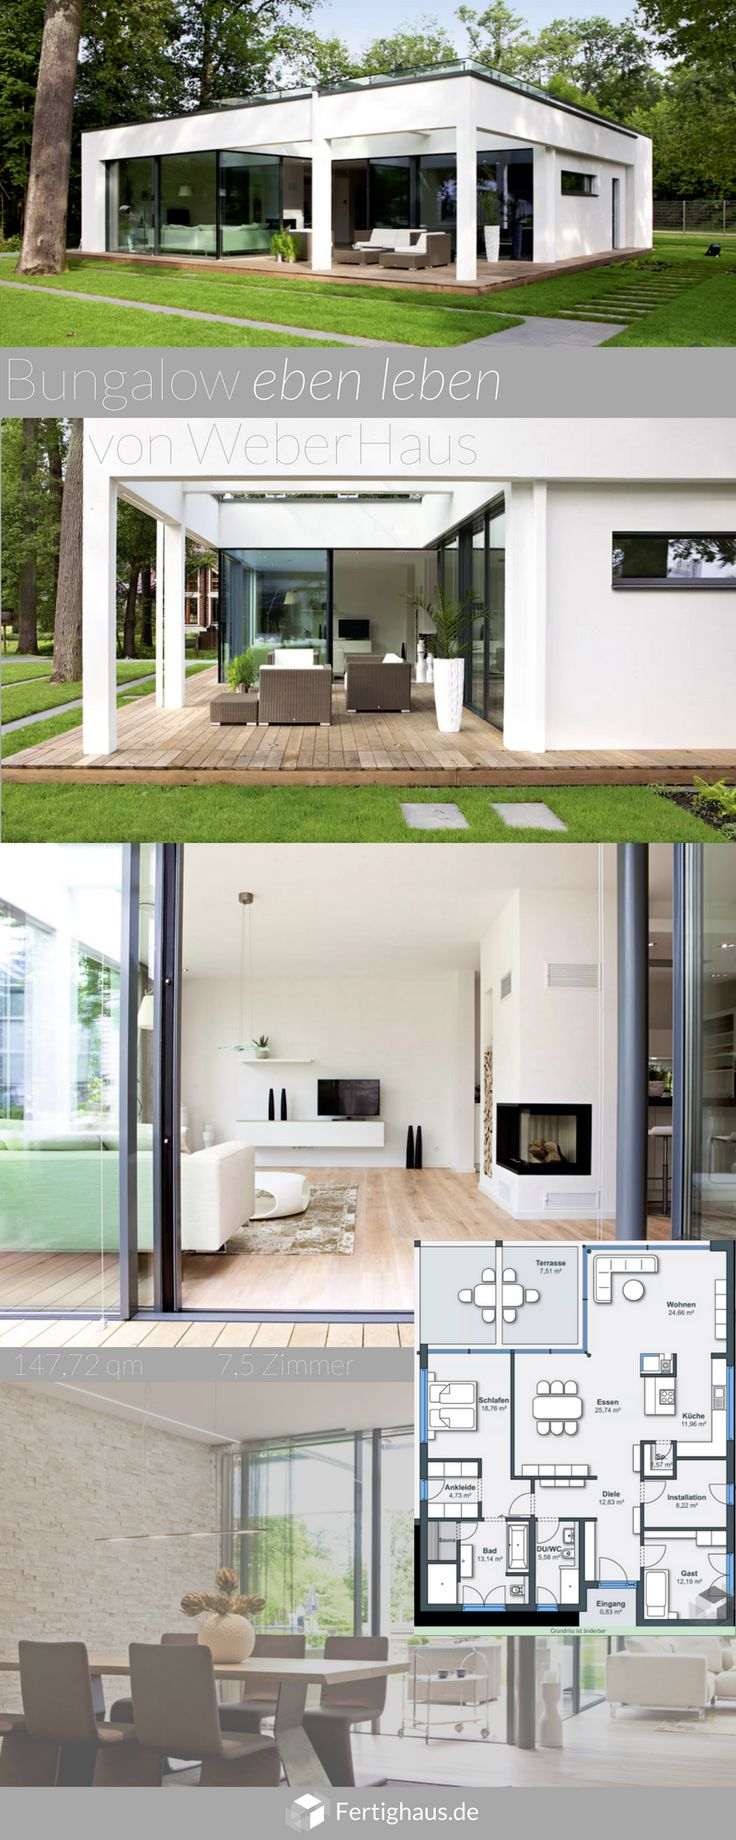 1628 best home design images on pinterest modern homes modern houses and contemporary. Black Bedroom Furniture Sets. Home Design Ideas